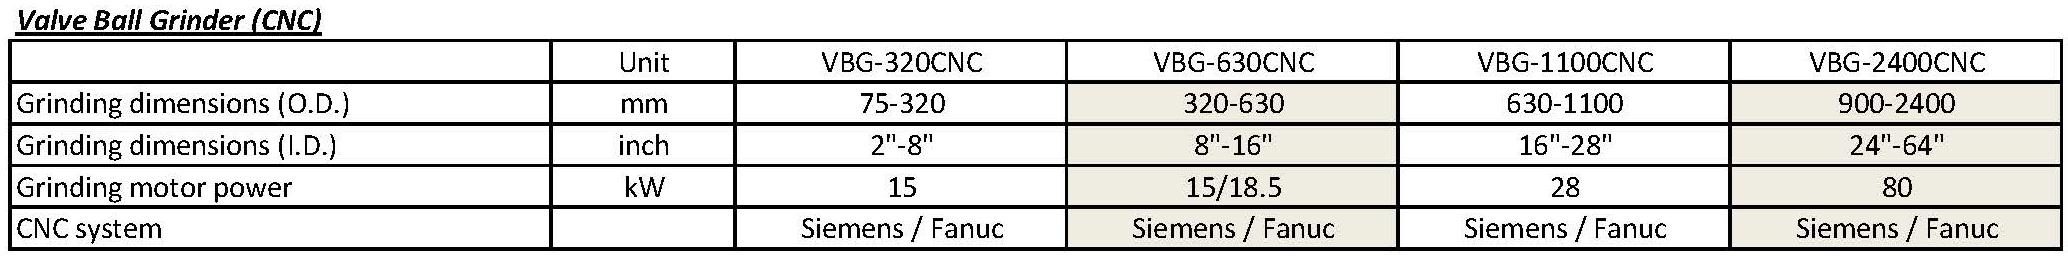 技术参数 - VBG CNC